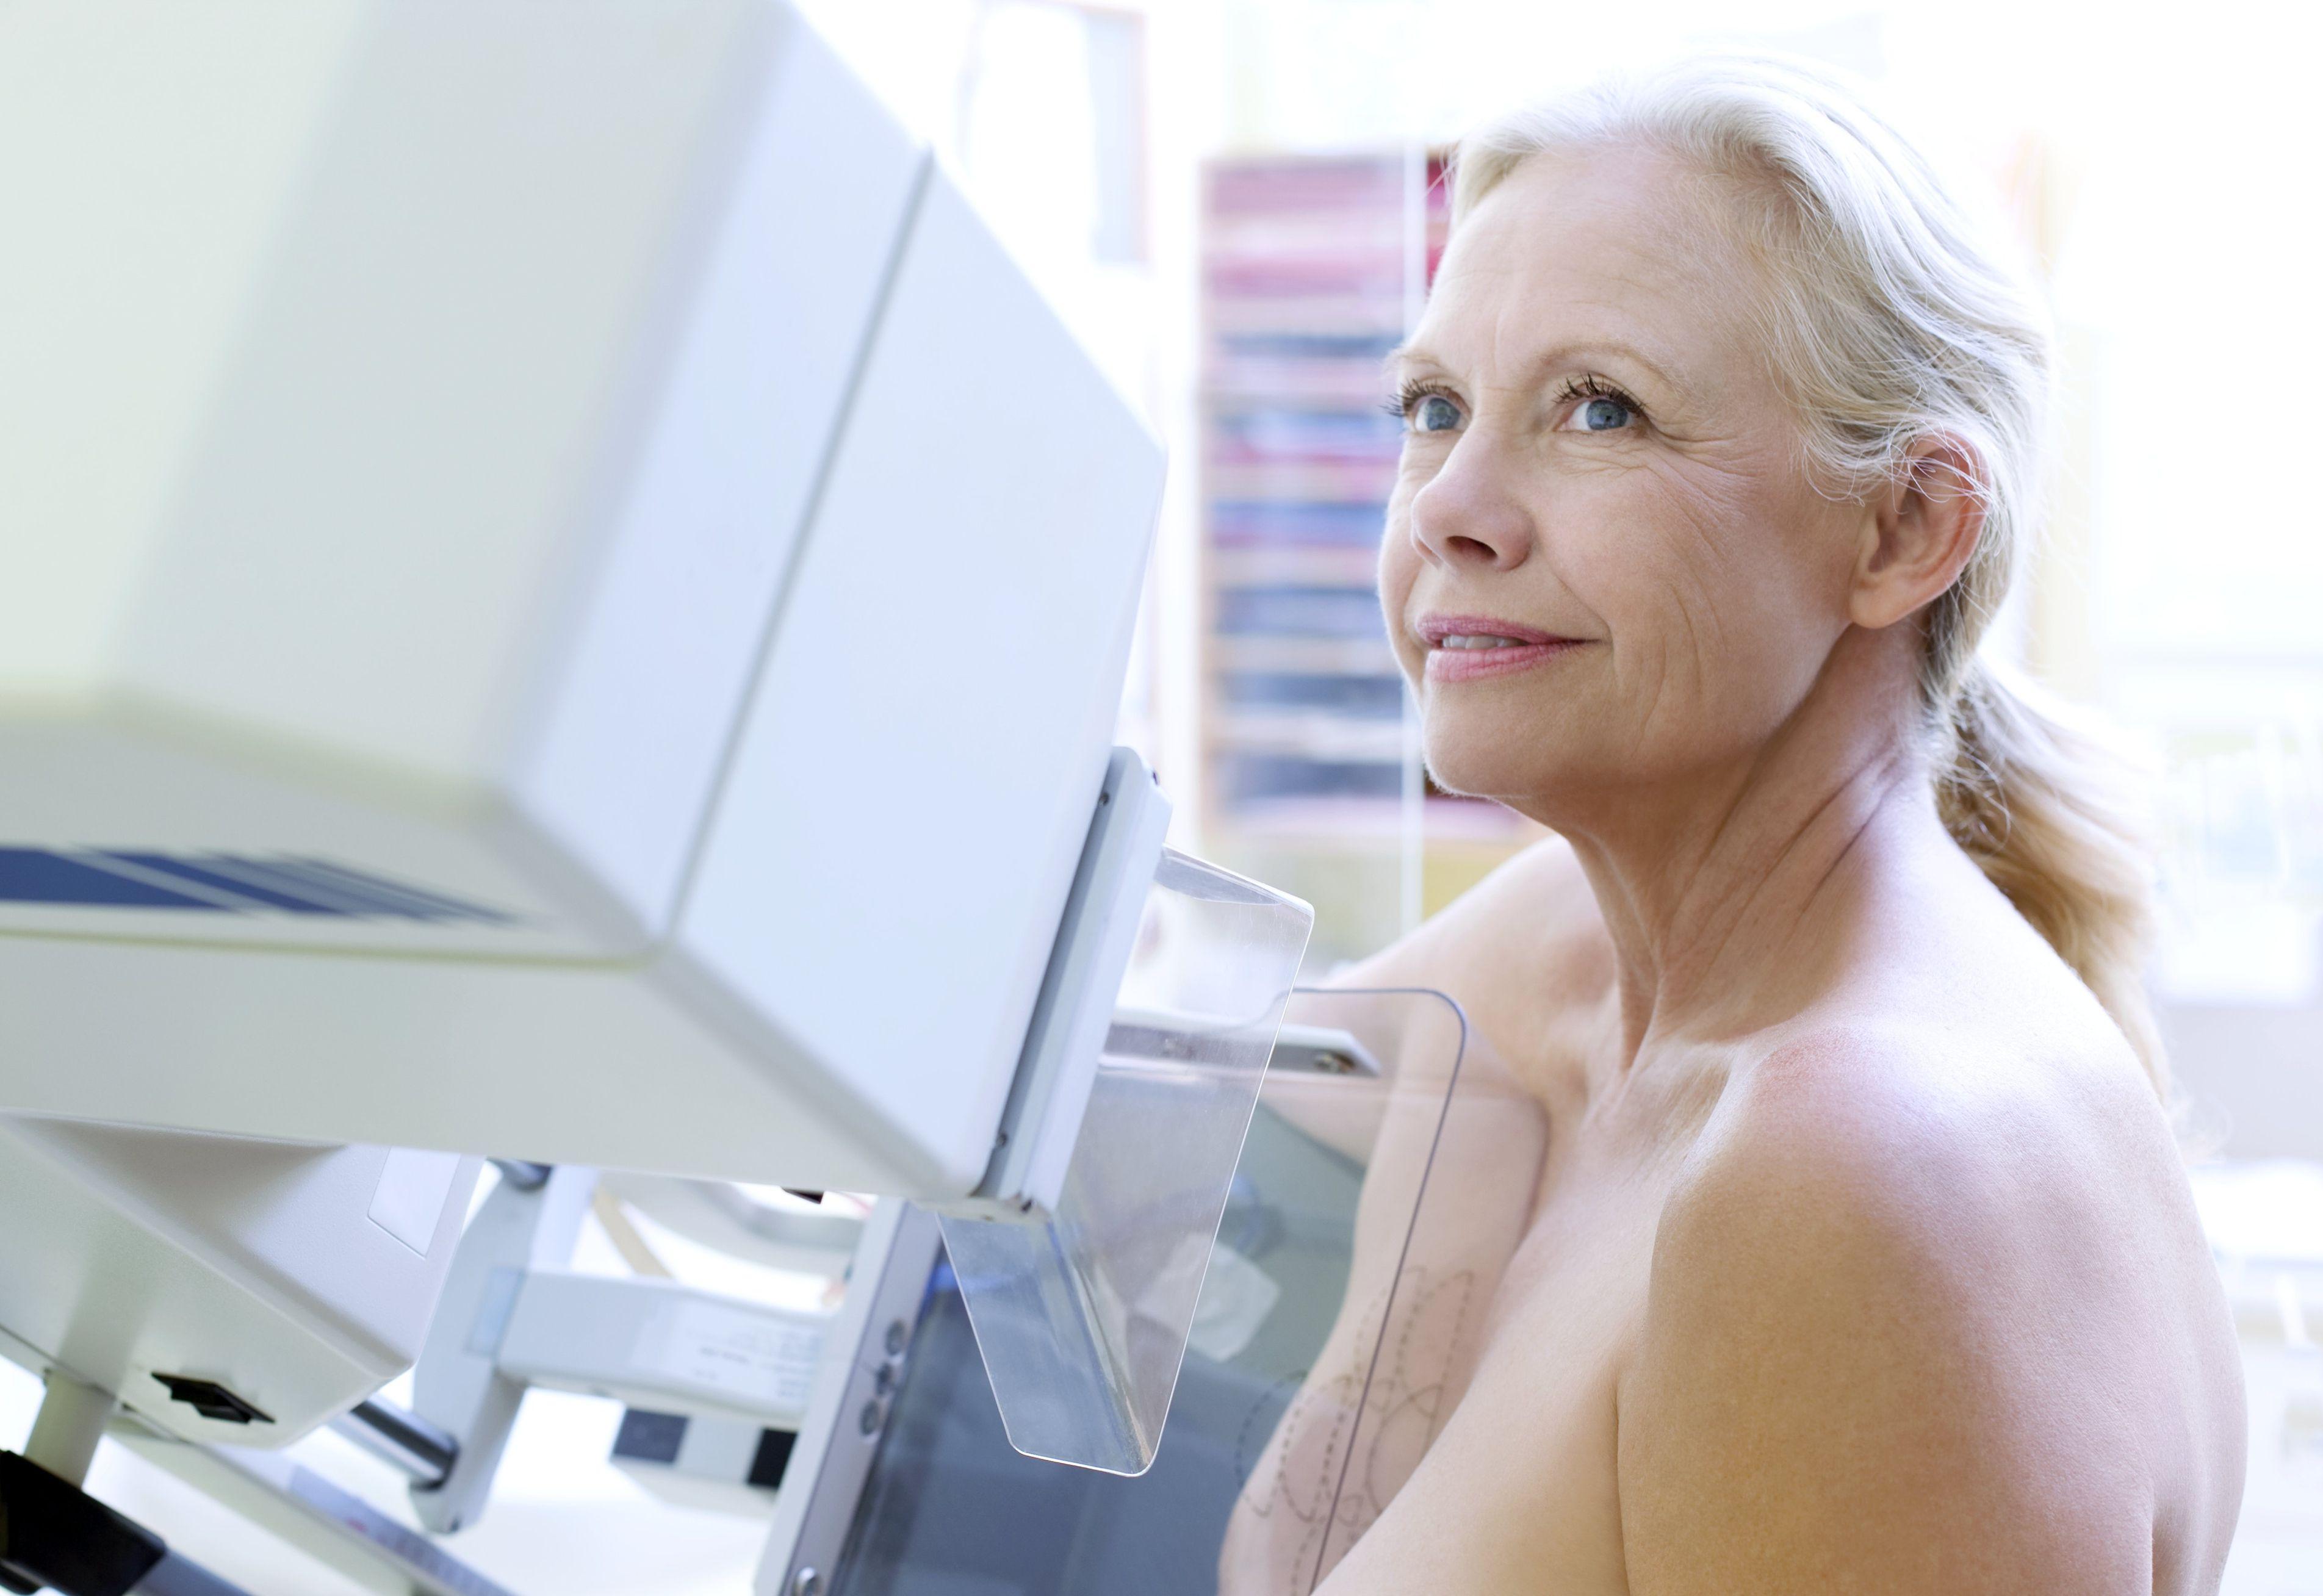 Breast Health Mammograms, Clinical Exams, Self-Exams-3155